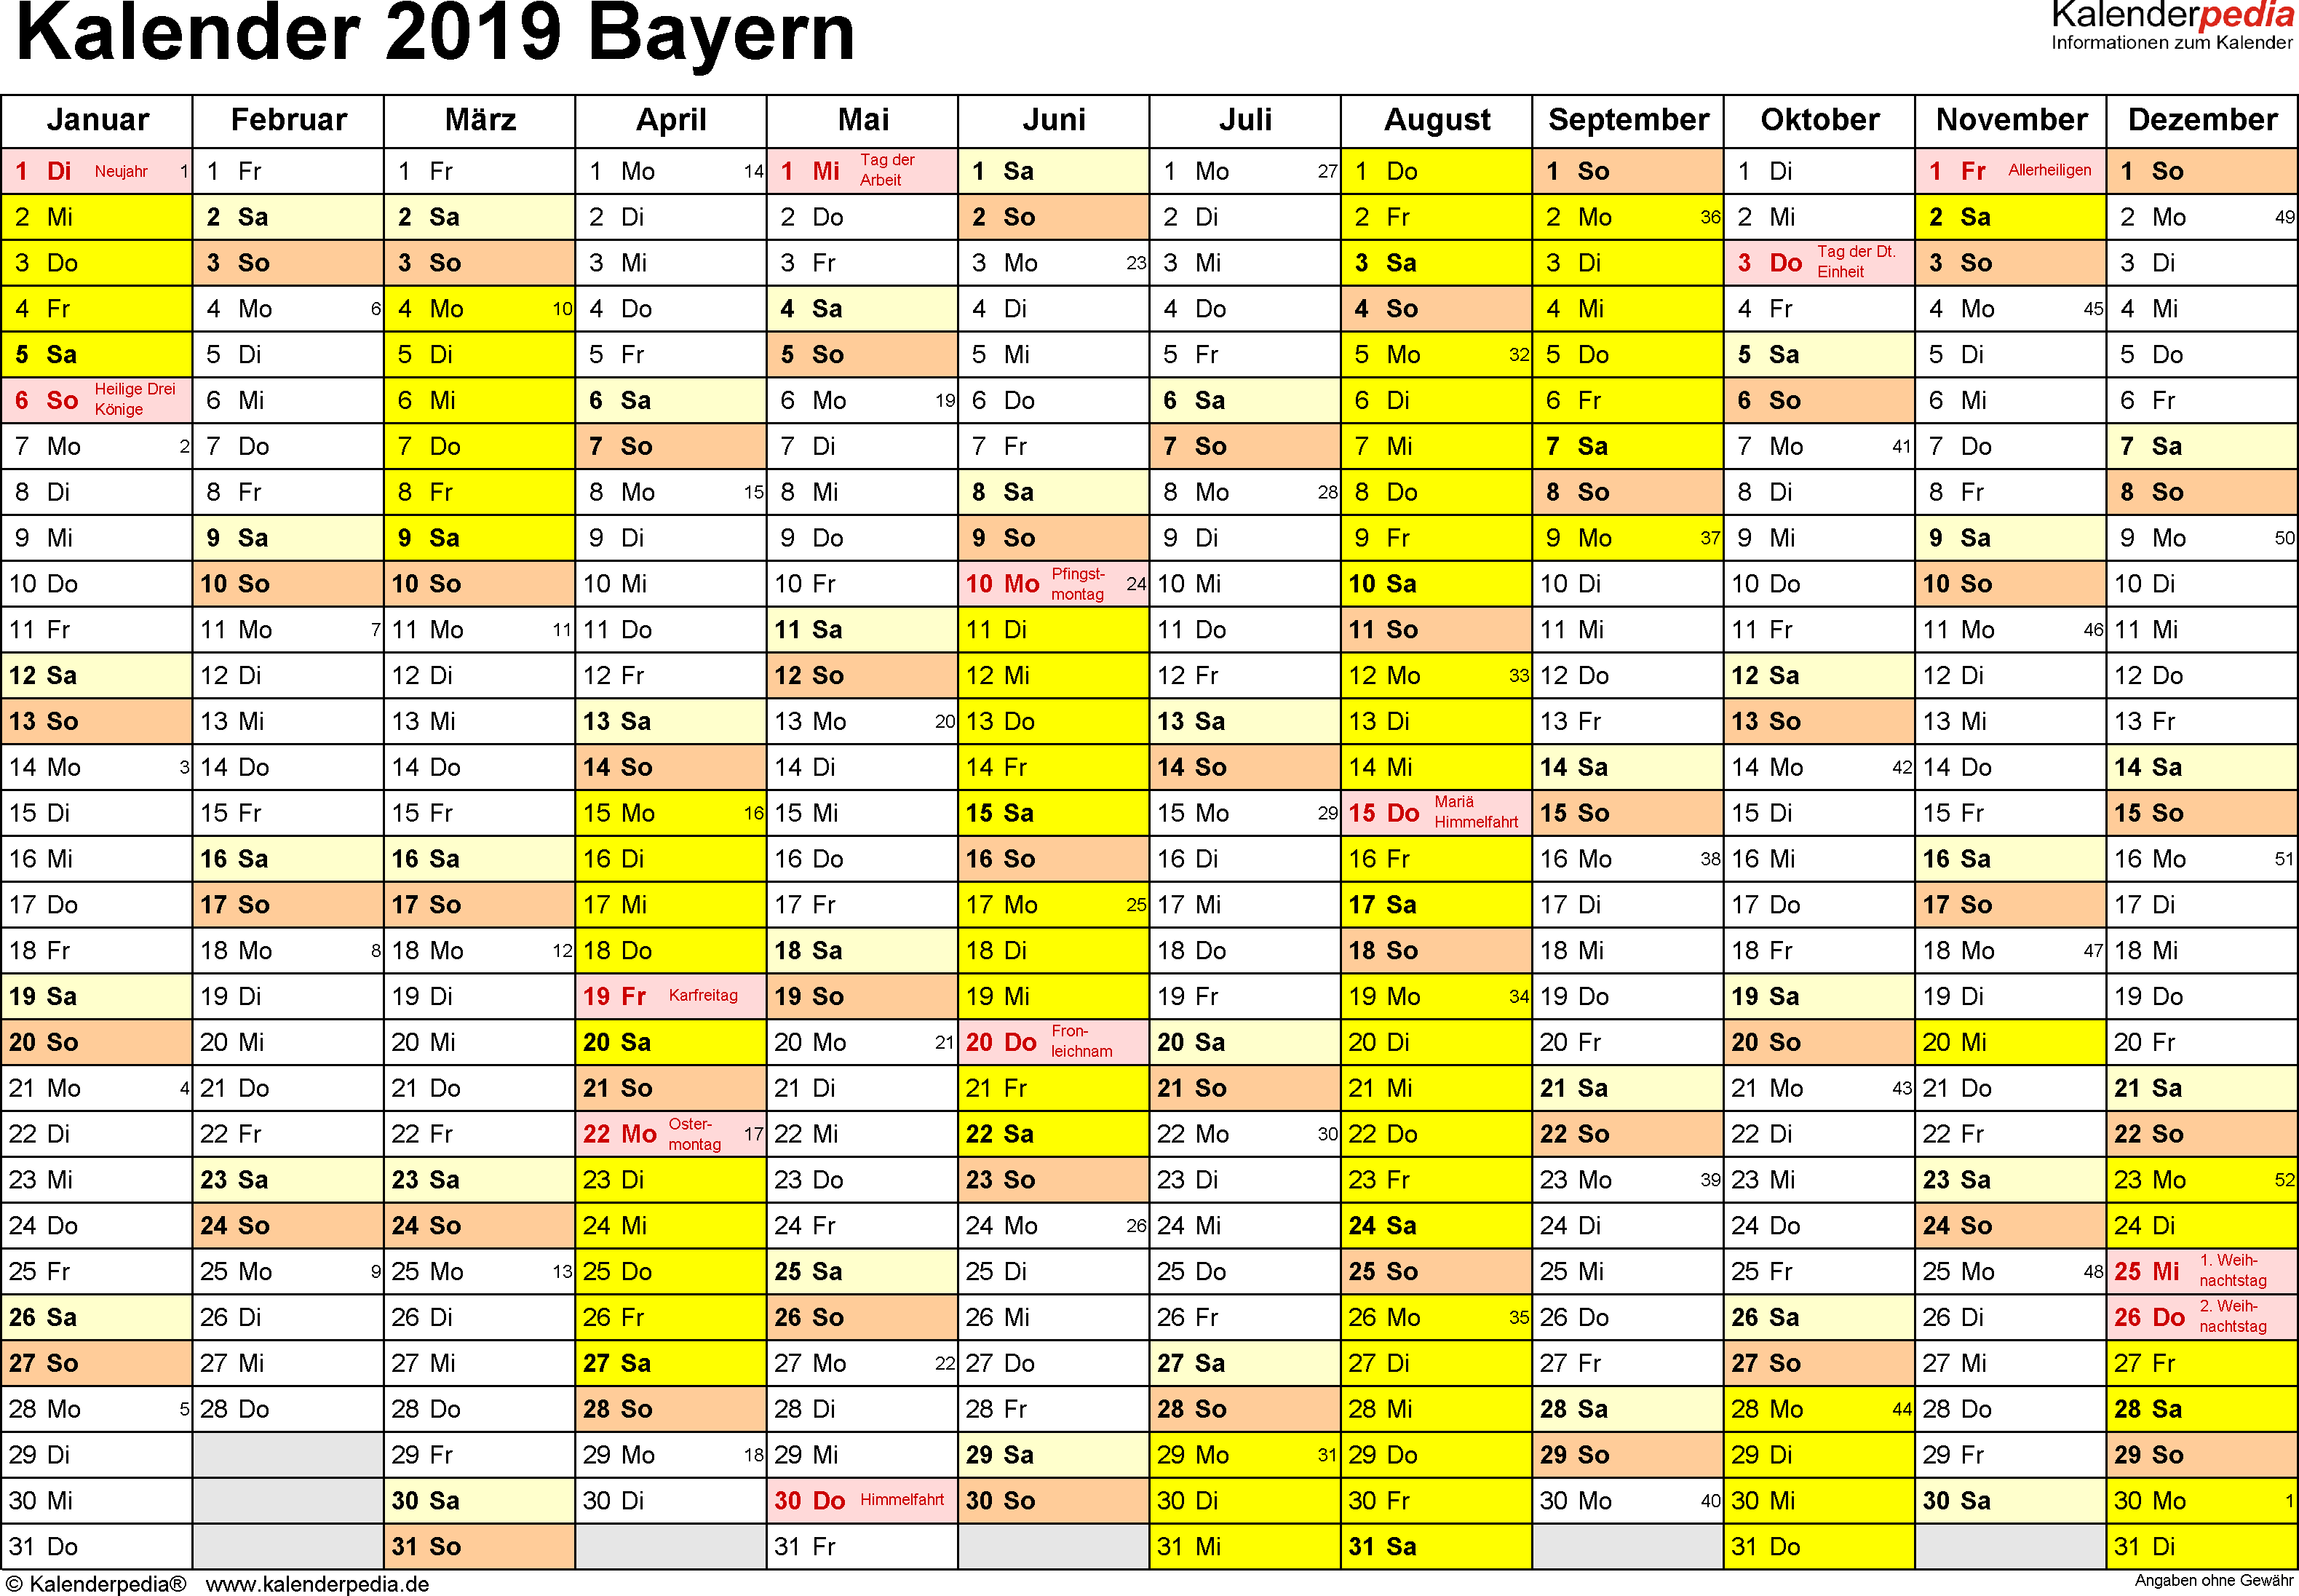 Kalender 2019 Bayern